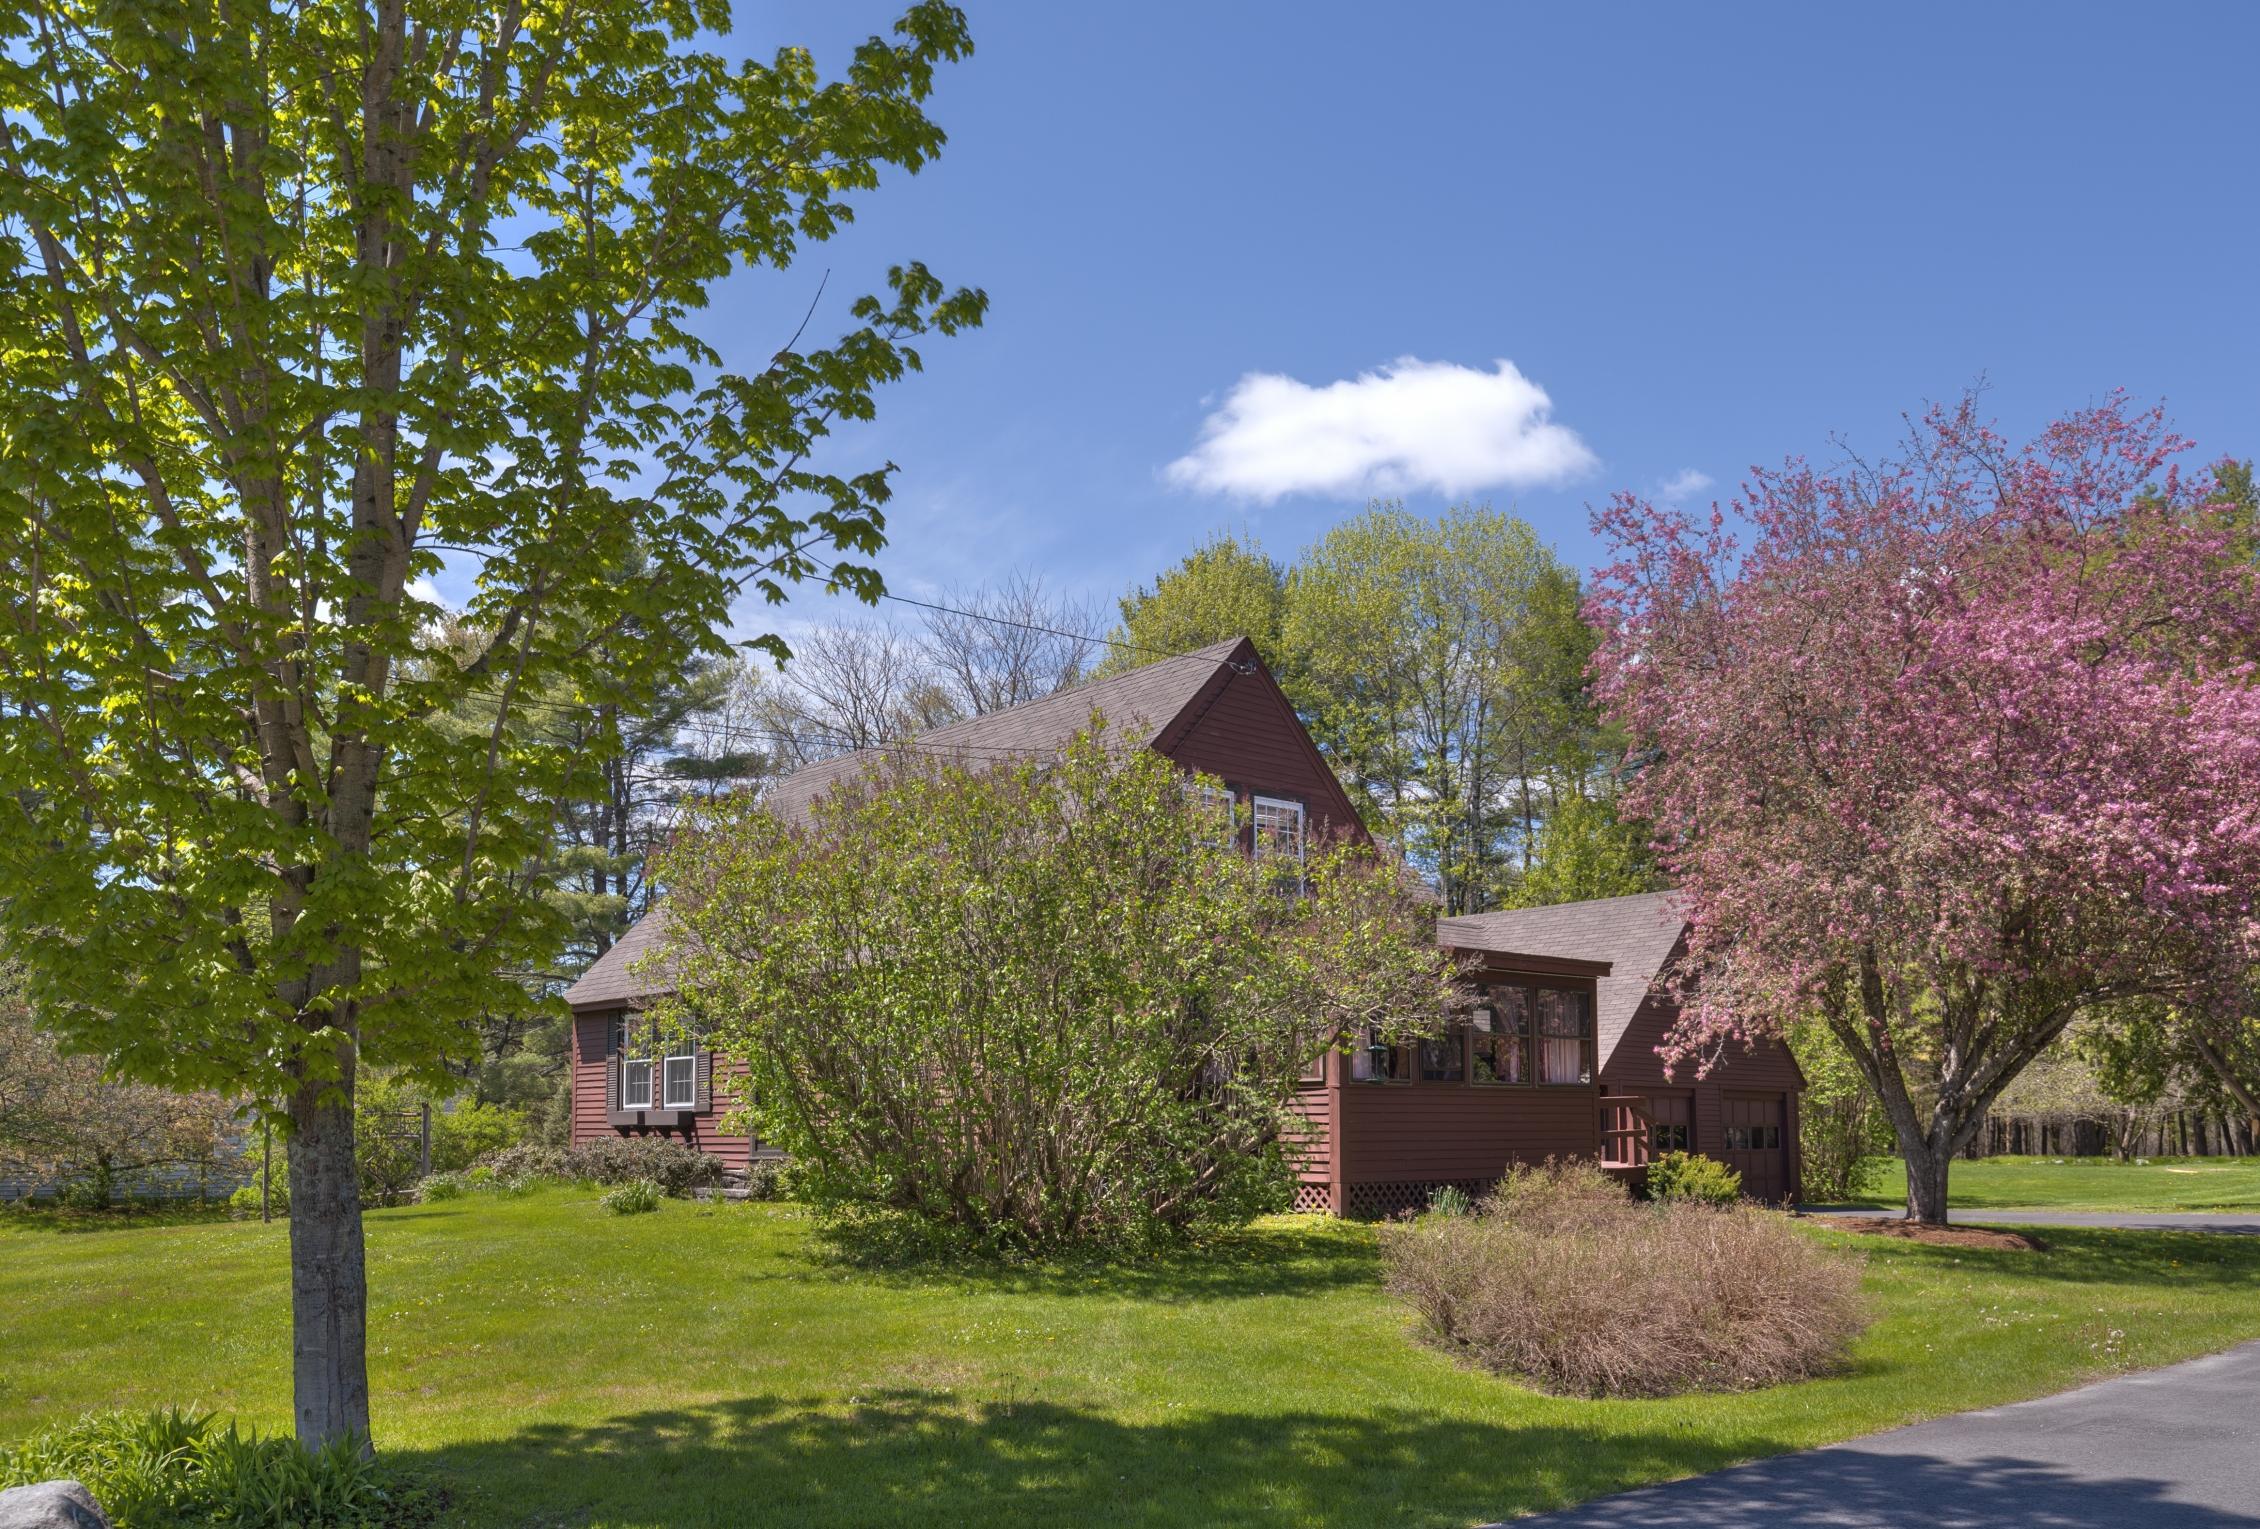 Single Family Home for Sale at 100 Greensboro, Hanover 100 Greensboro Rd Hanover, New Hampshire, 03755 United States